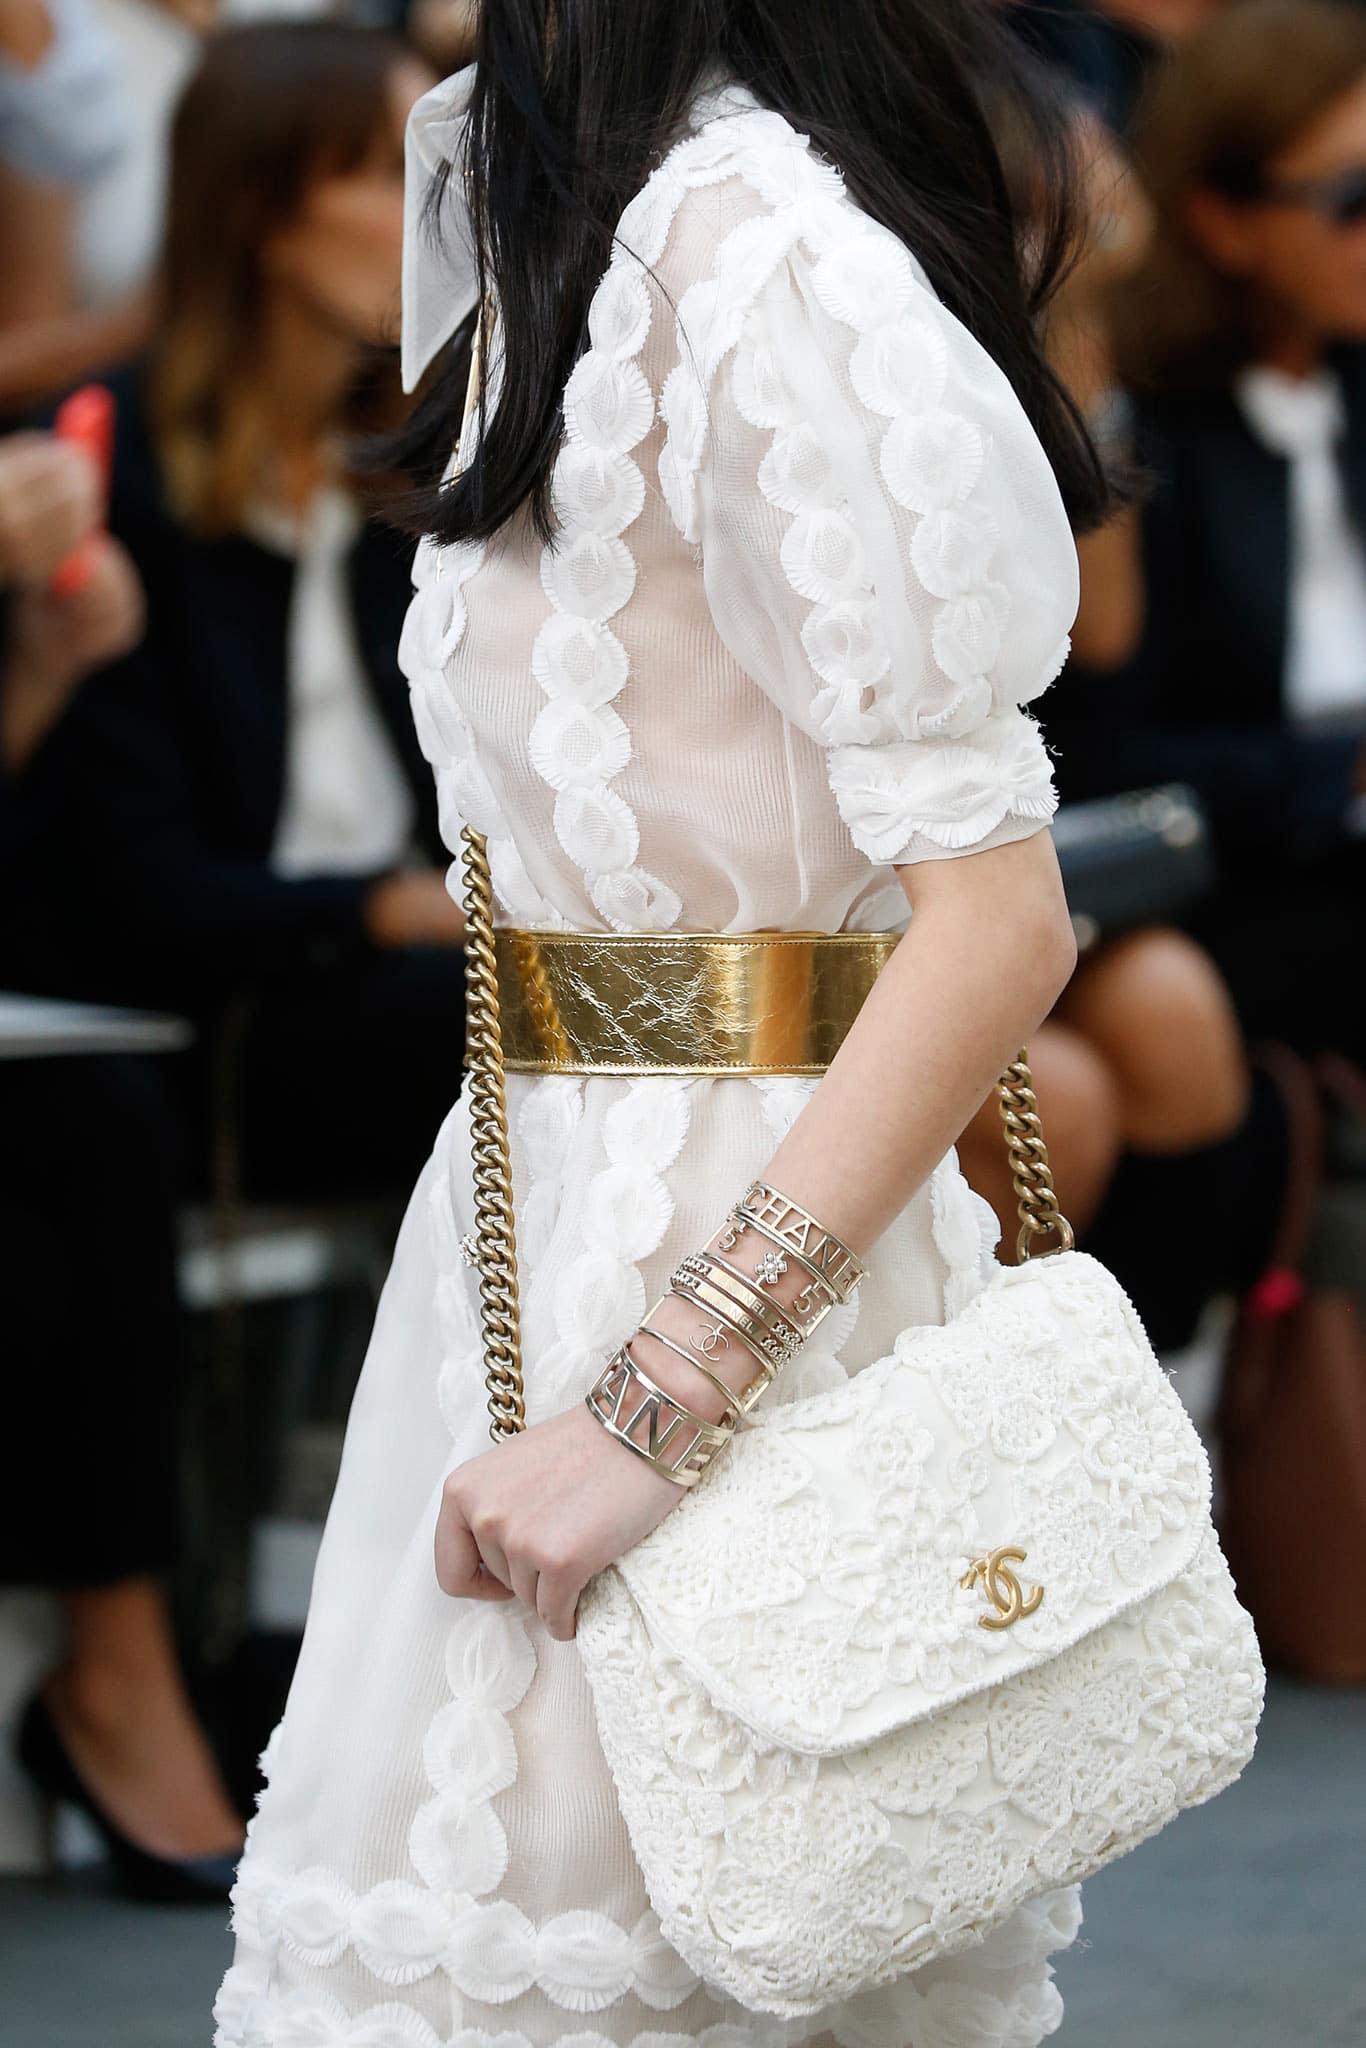 Chanel Spring Summer 2017: Chanel Spring / Summer 2015 Runway Bag Collection